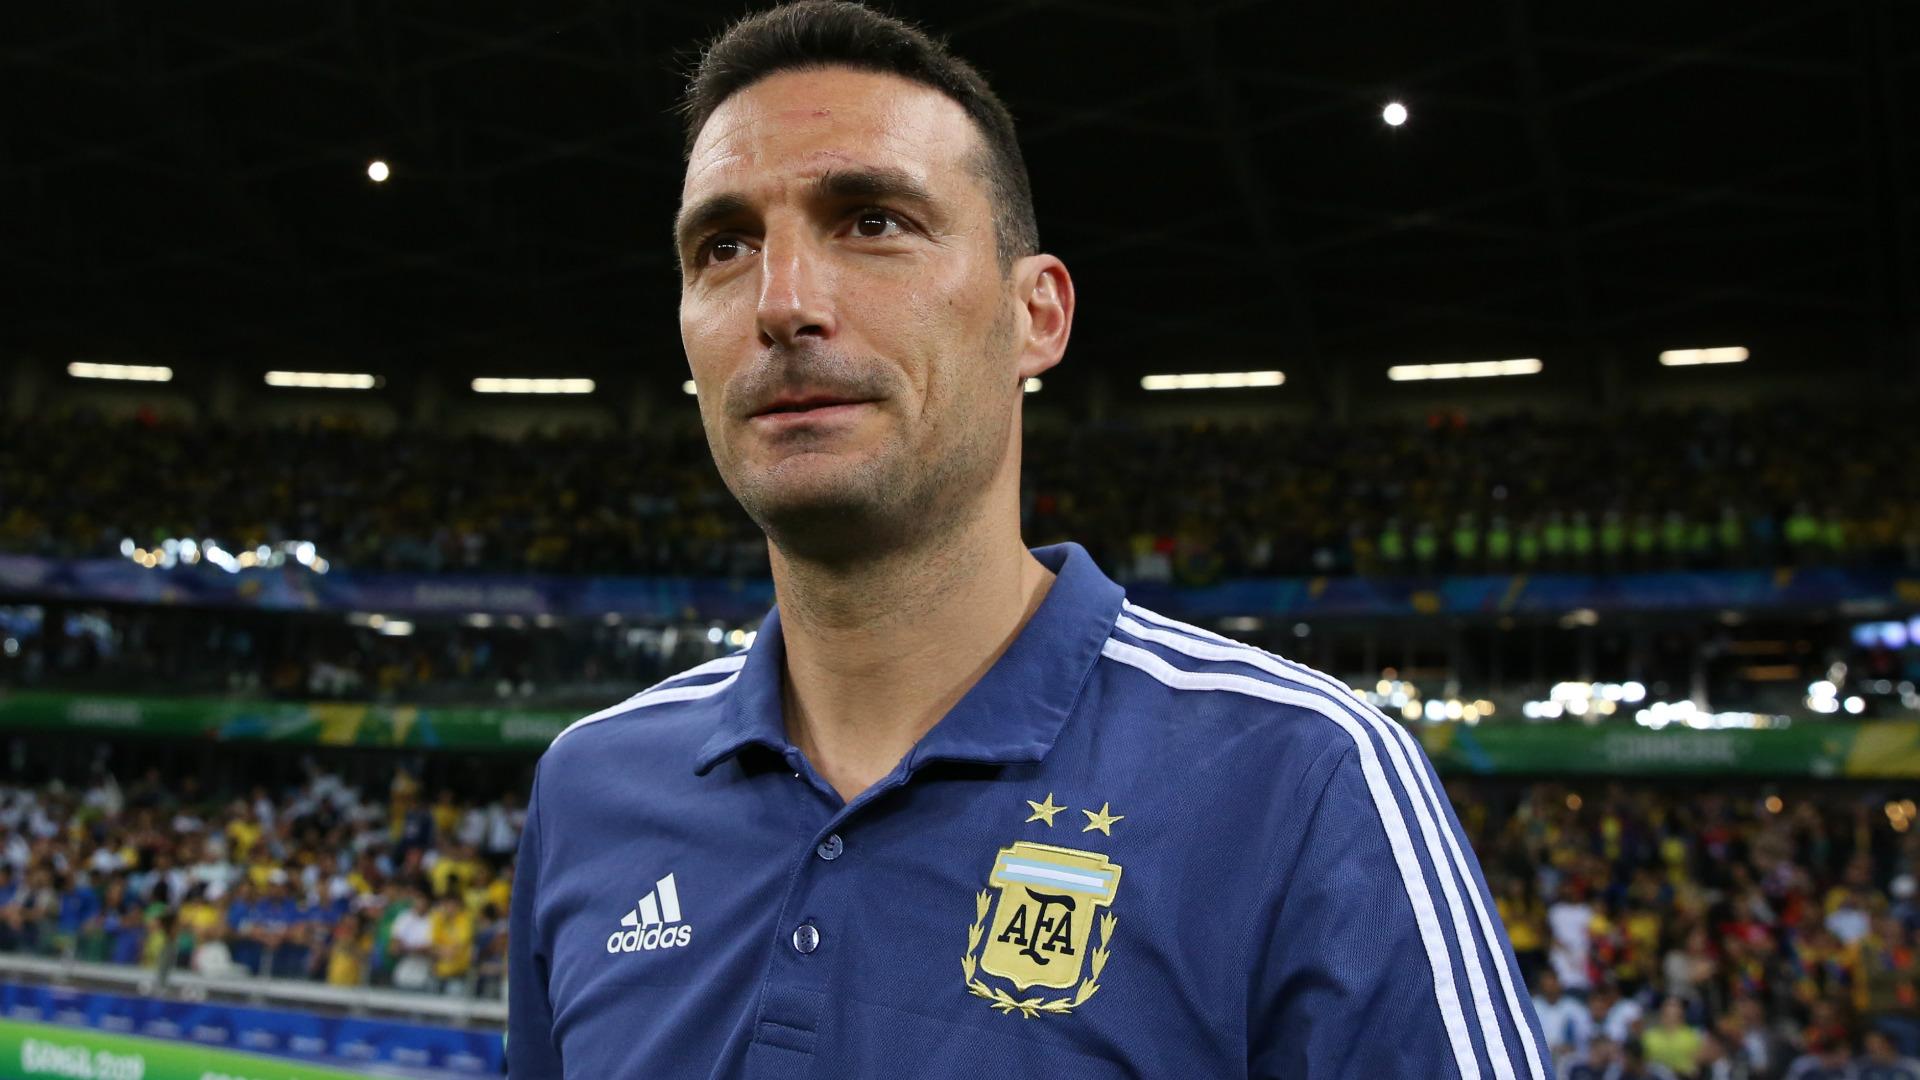 Scaloni Brazil Argentina Copa America 02072019